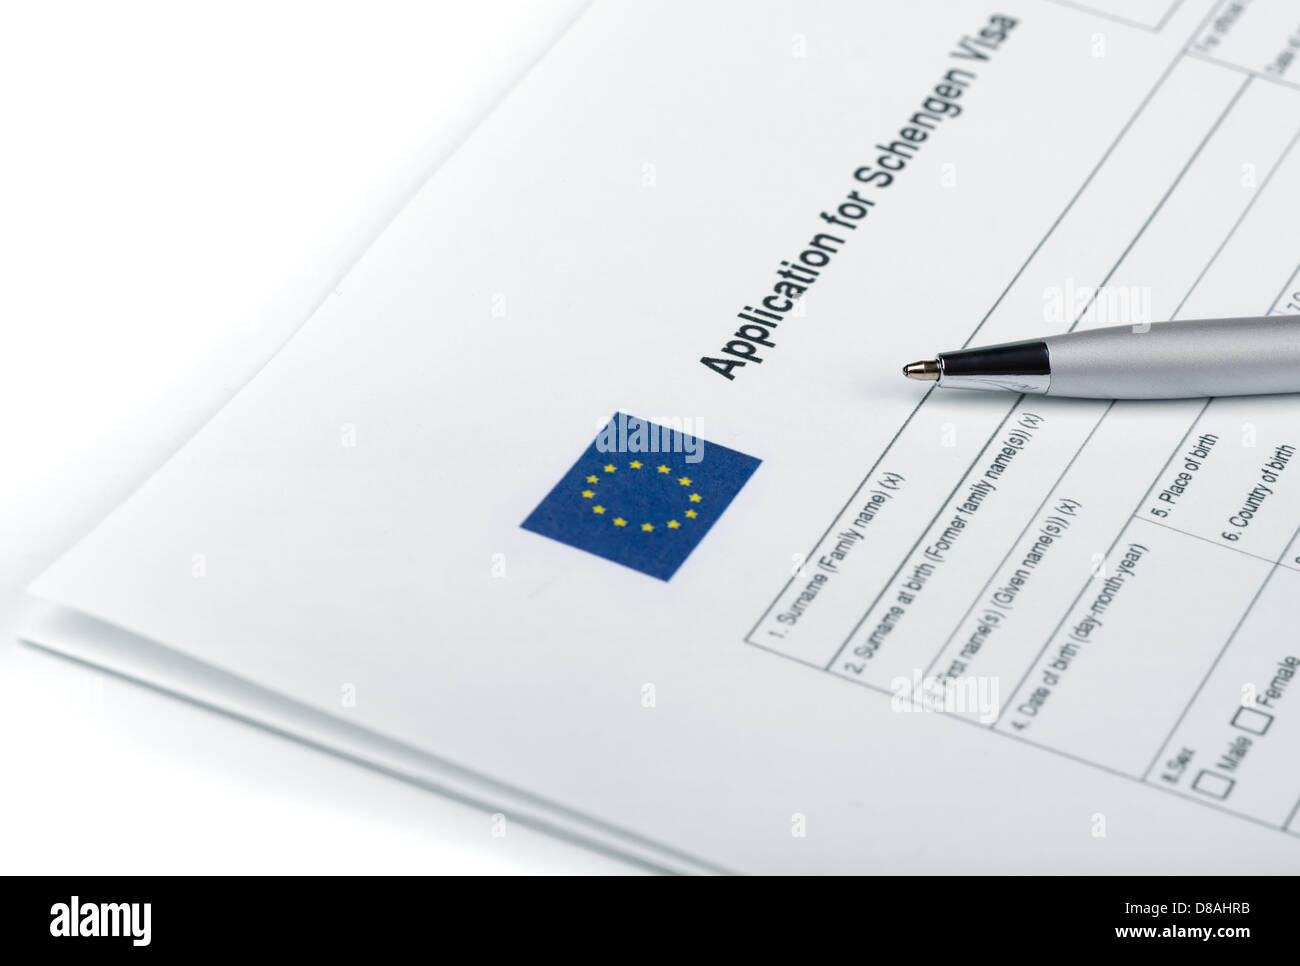 Blank applicatoin for Schengen Visa and pen - Stock Image